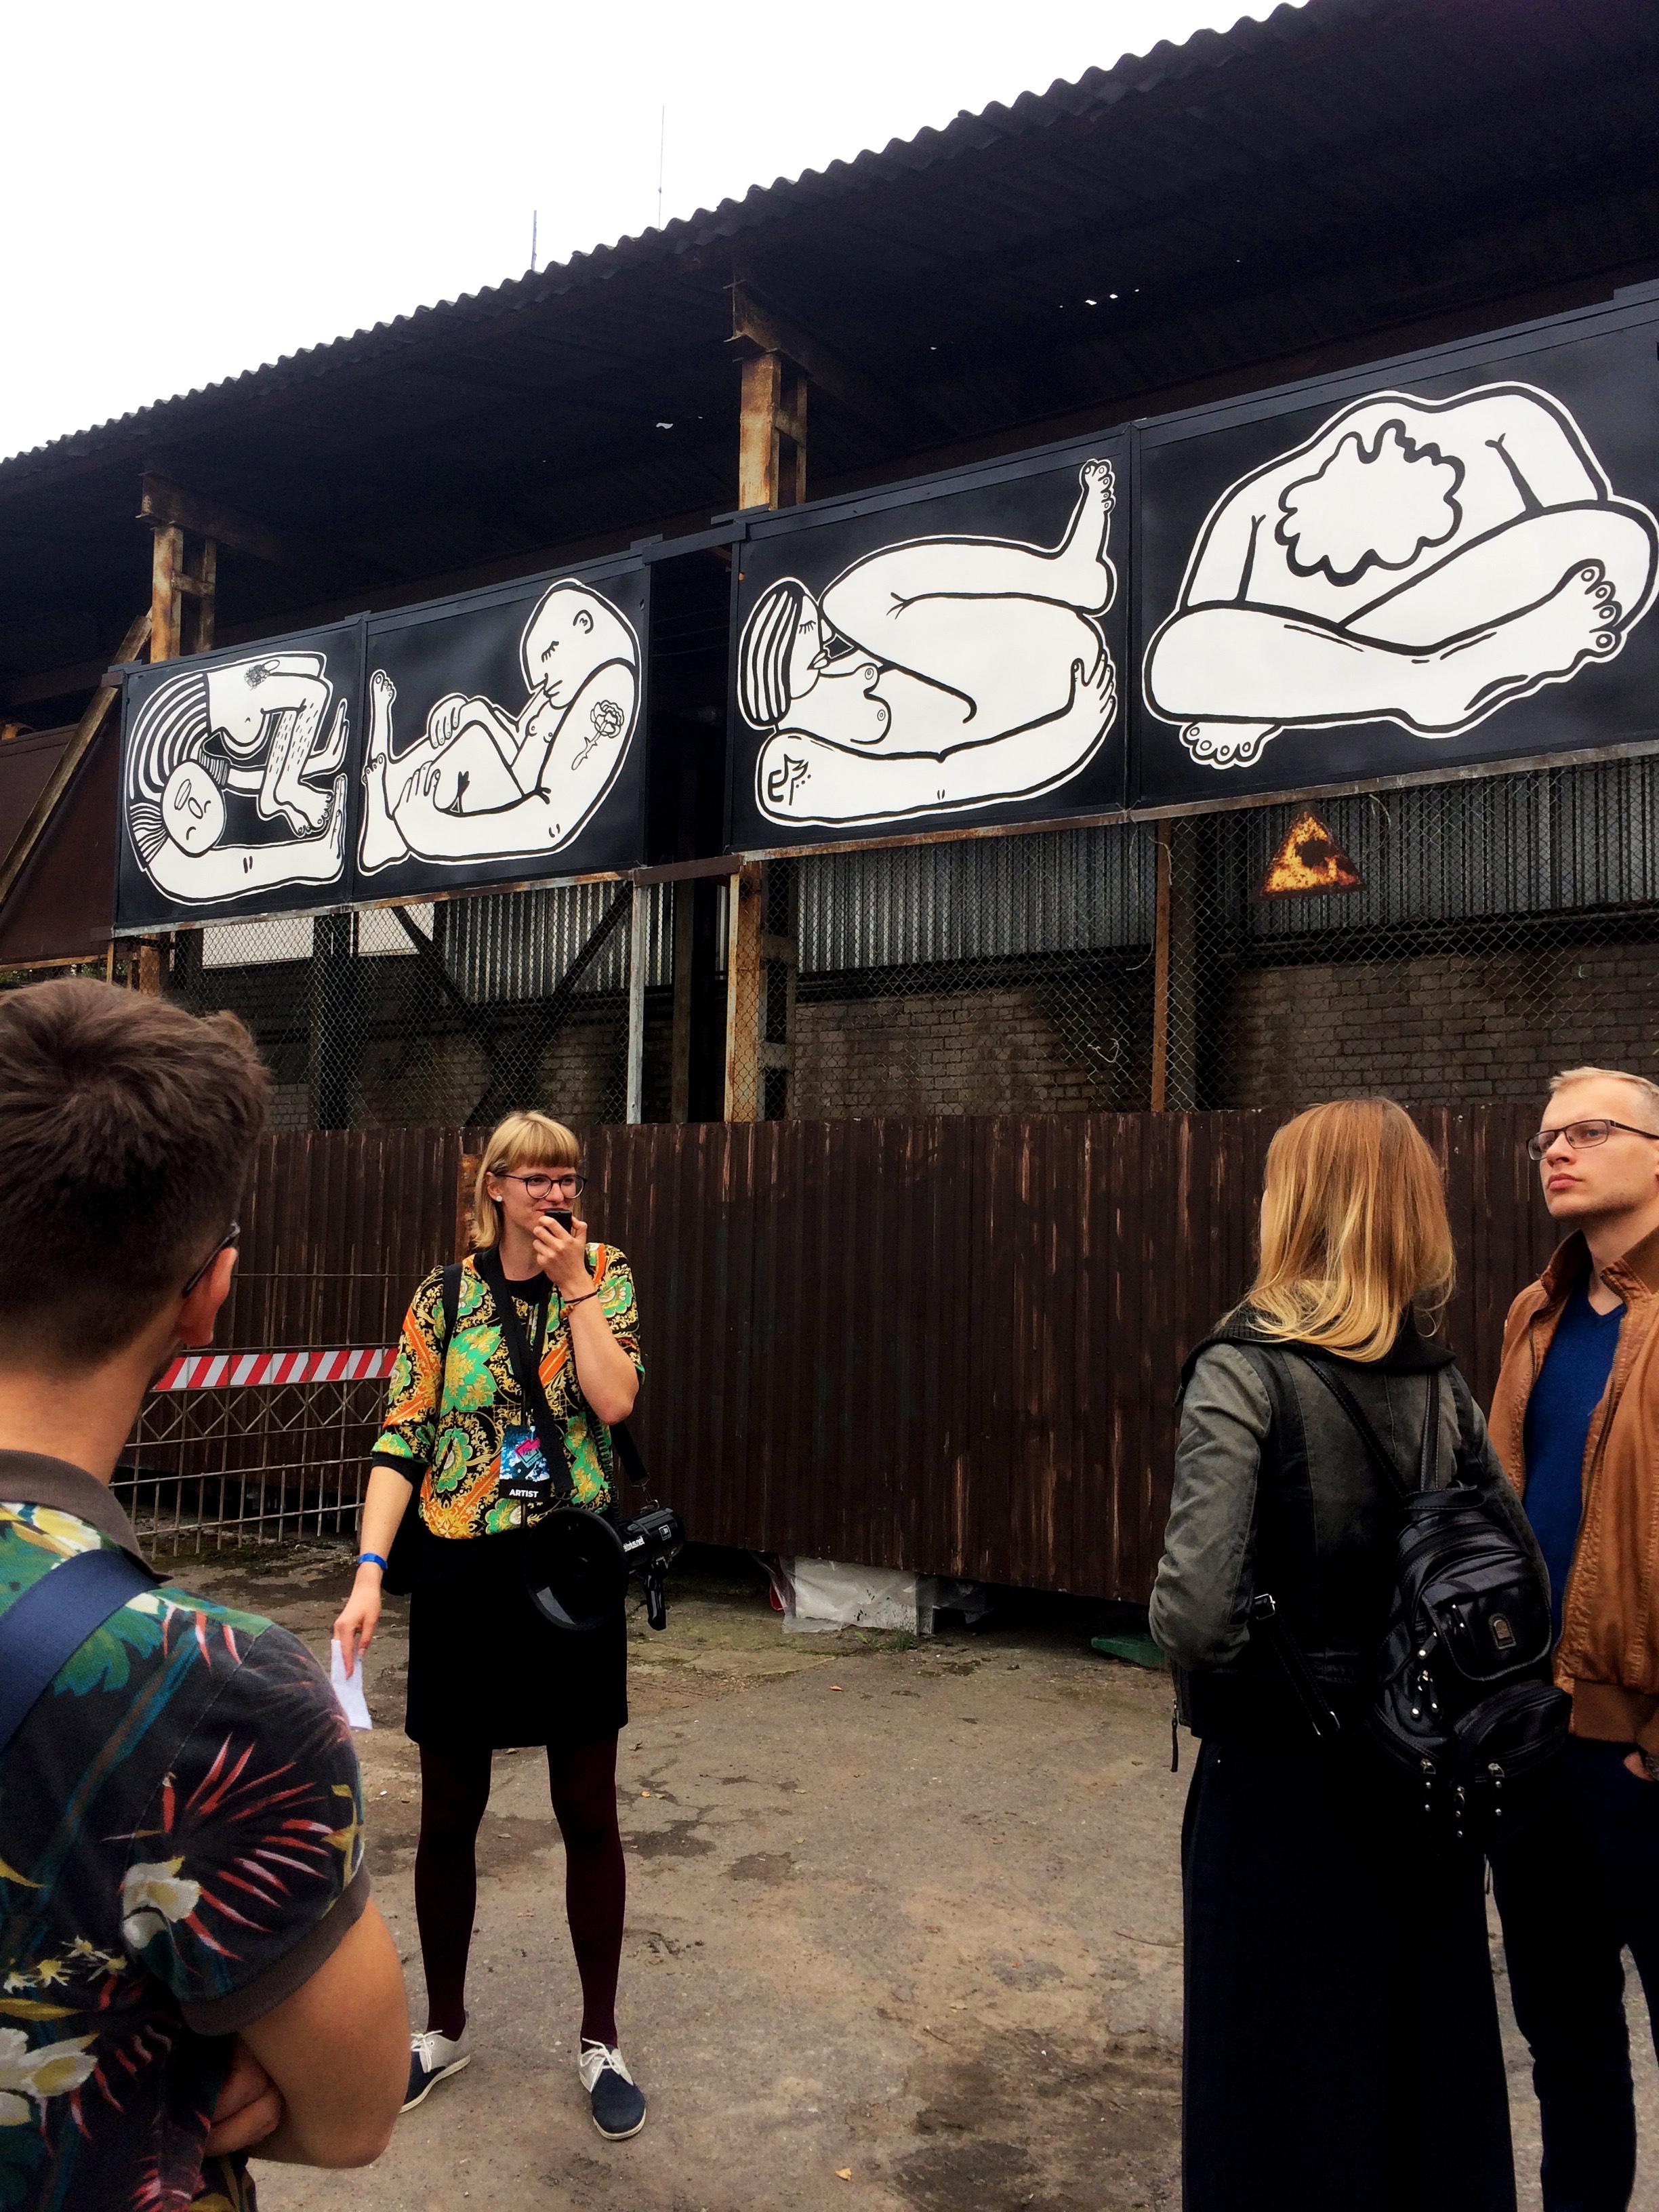 Street art guide Ieva presenting my